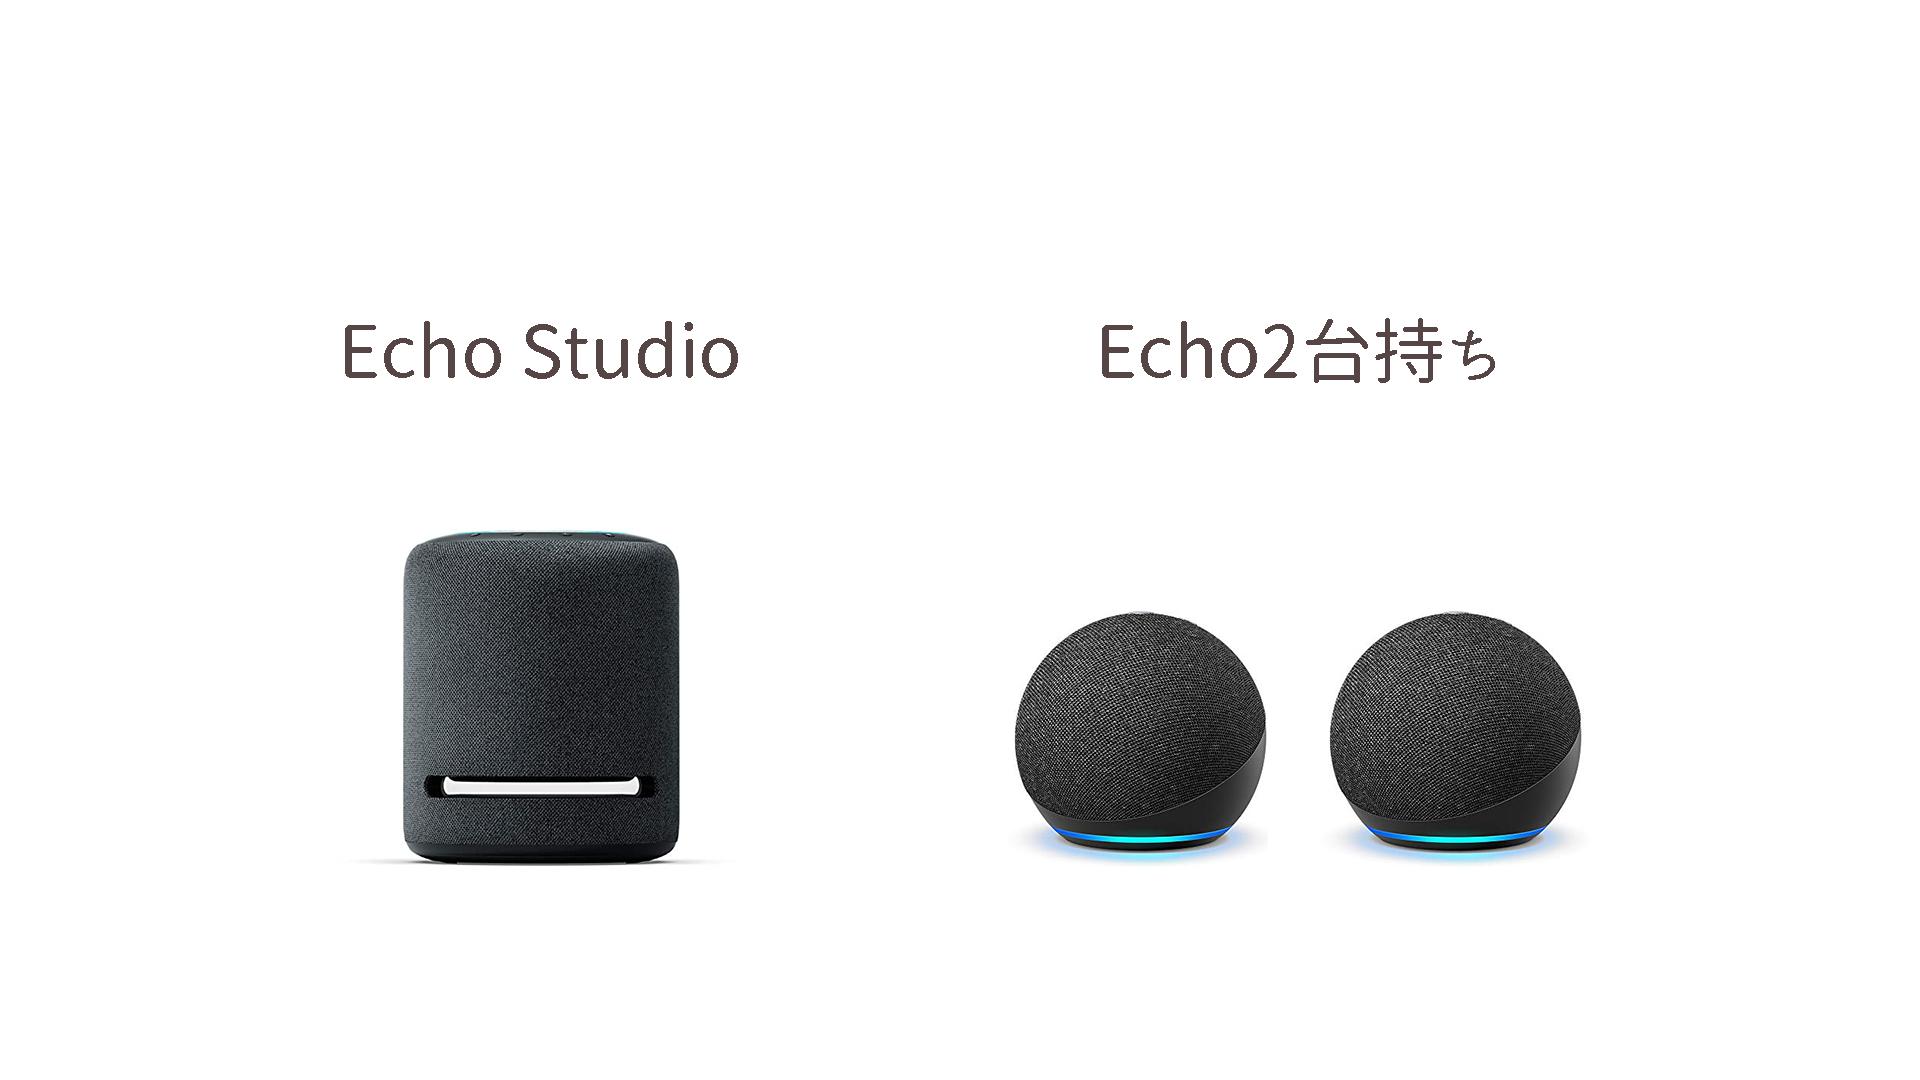 EchoStudio